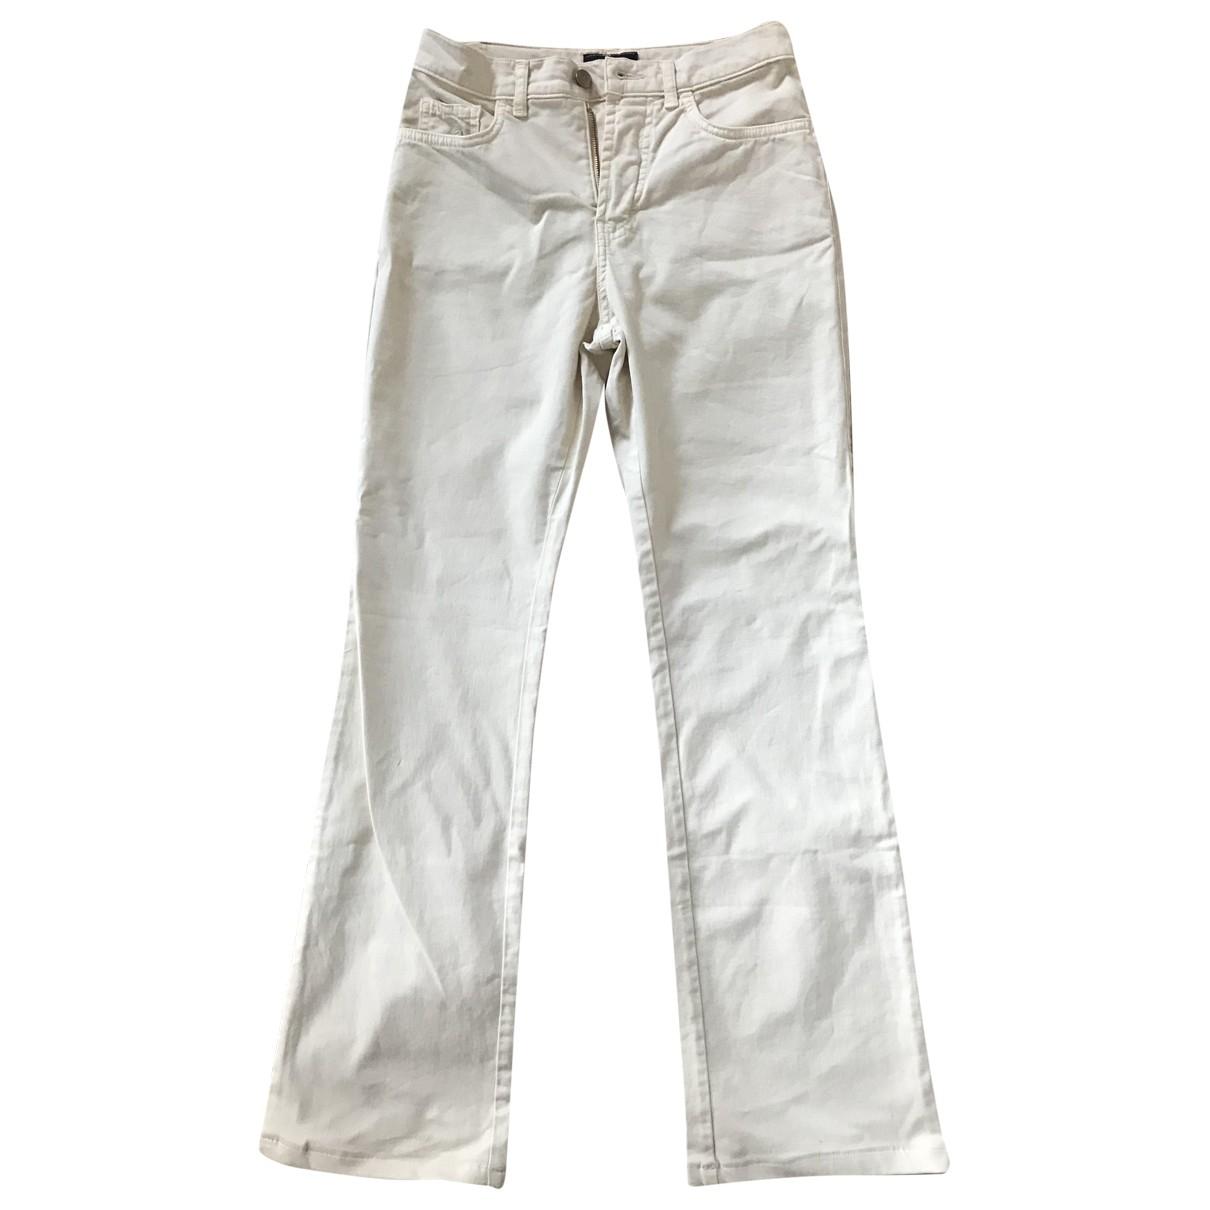 Trussardi Jeans \N Beige Cotton - elasthane Jeans for Women 26 US